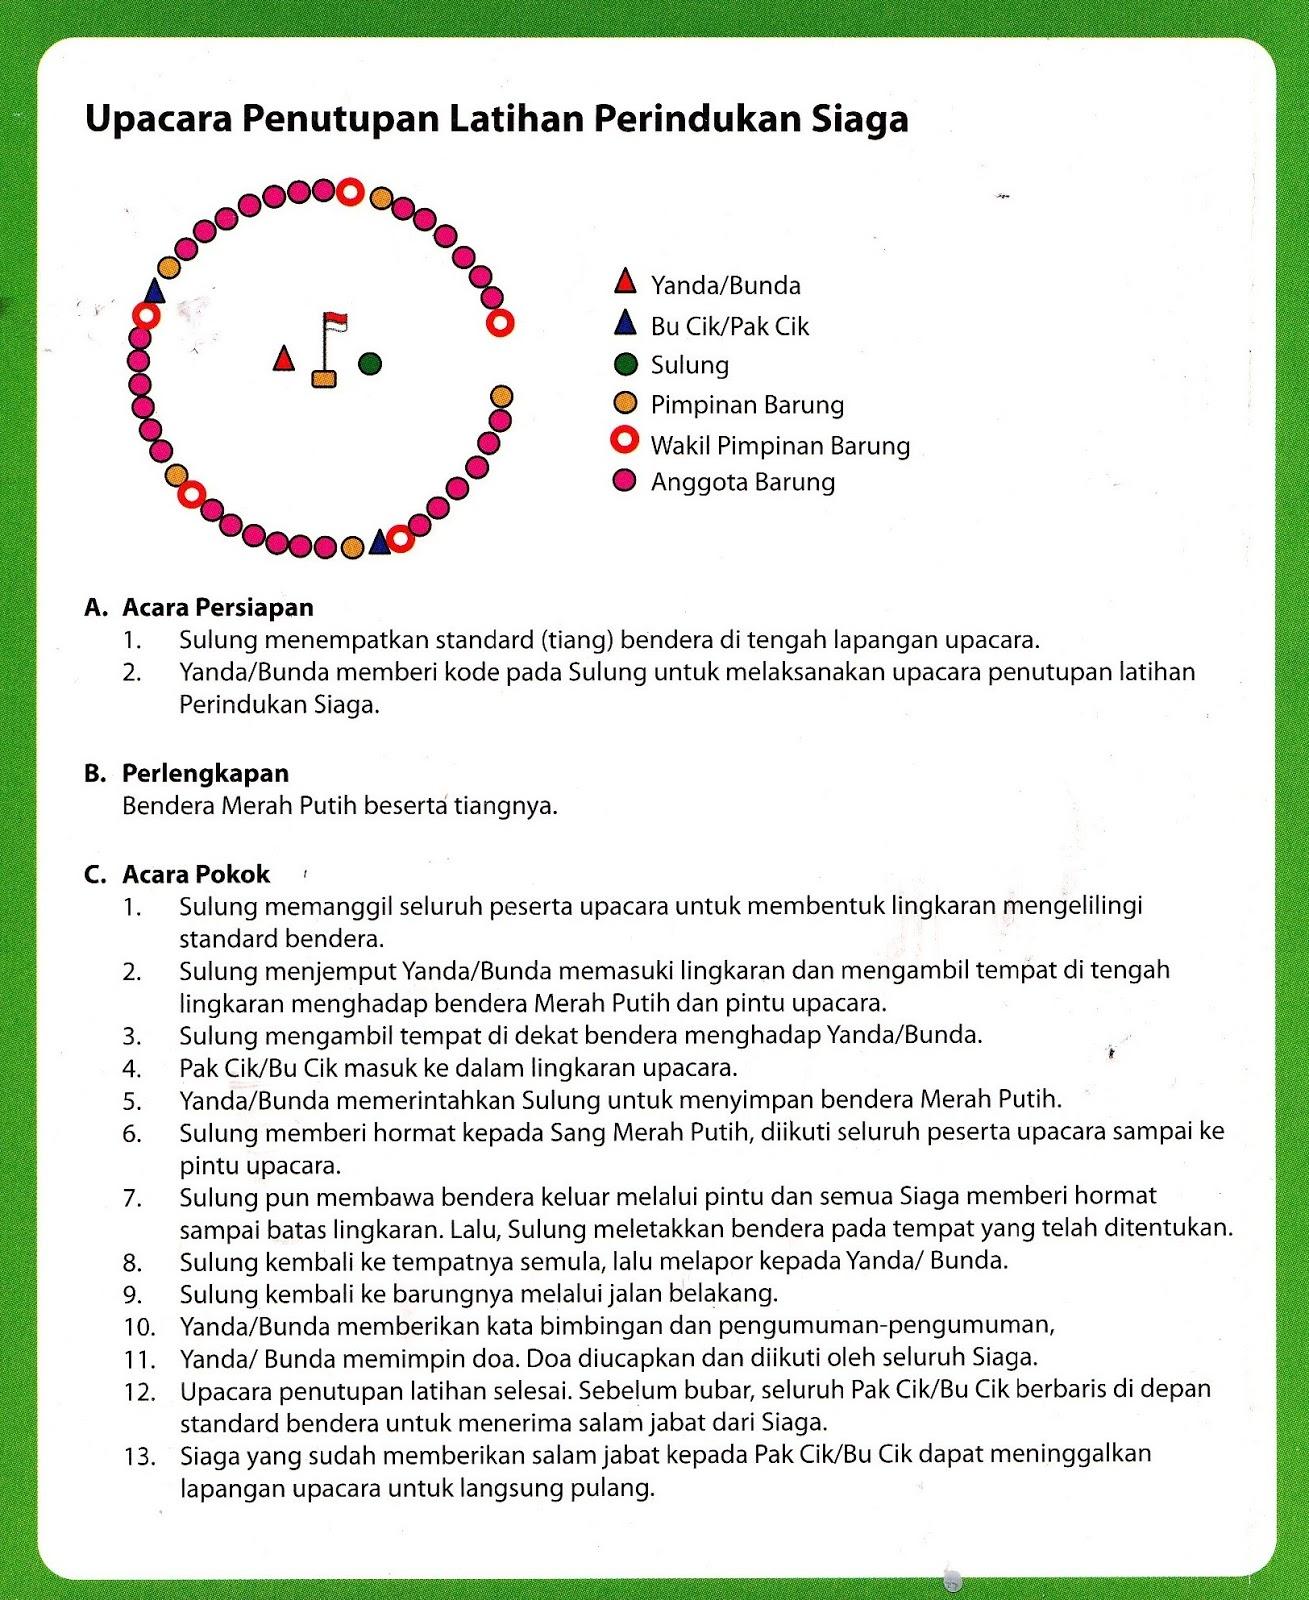 Upacara Pramuka Siaga : upacara, pramuka, siaga, Upacara, Pramuka, Tingkat, Siaga, Lengkap, Kwarran, Seorang